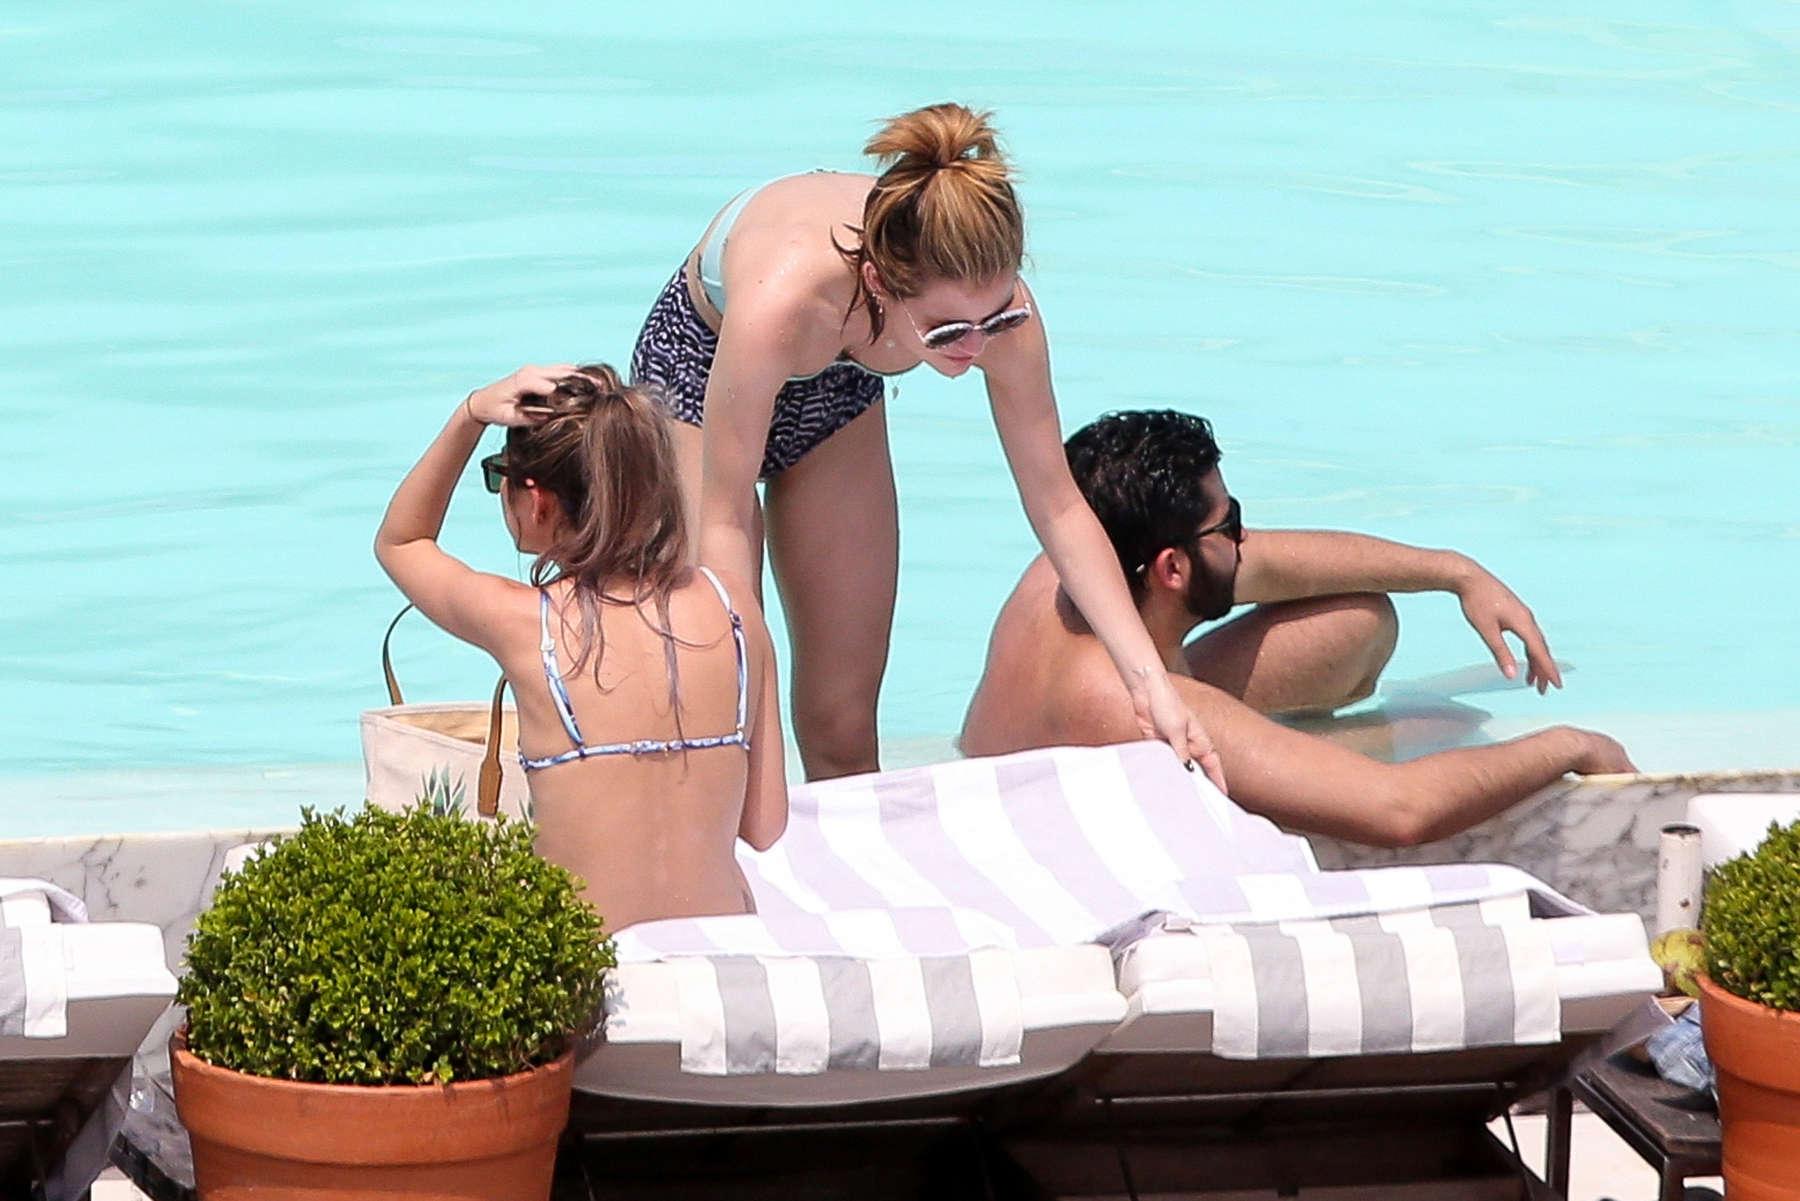 Lucy Hale 2016 : Lucy Hale in Bikini 2016 -18